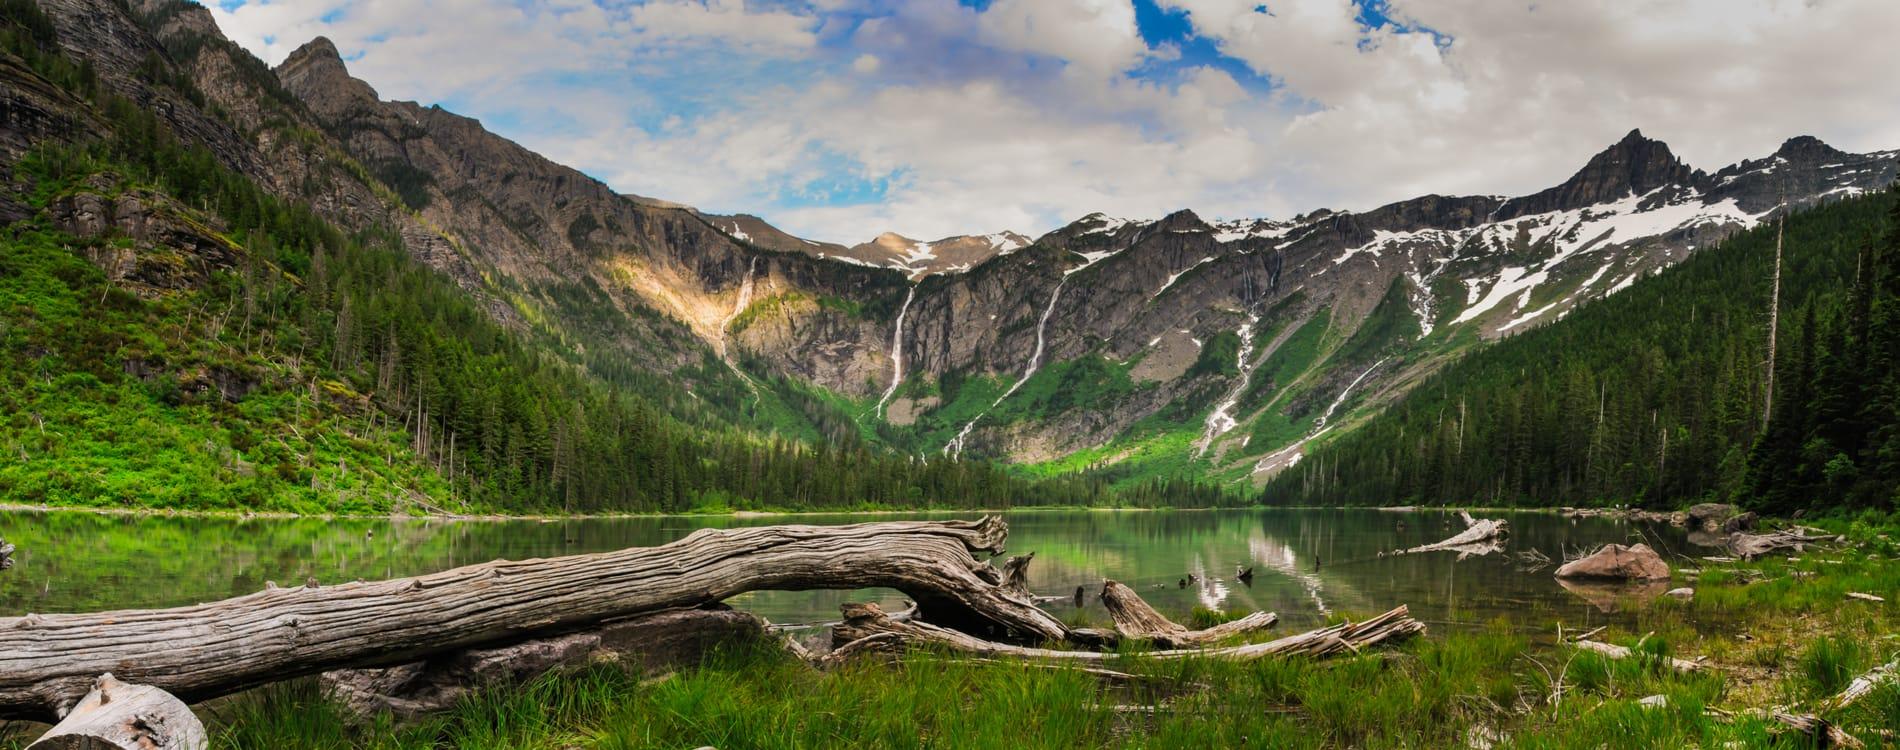 Glacier National Park - Avalanche Lake